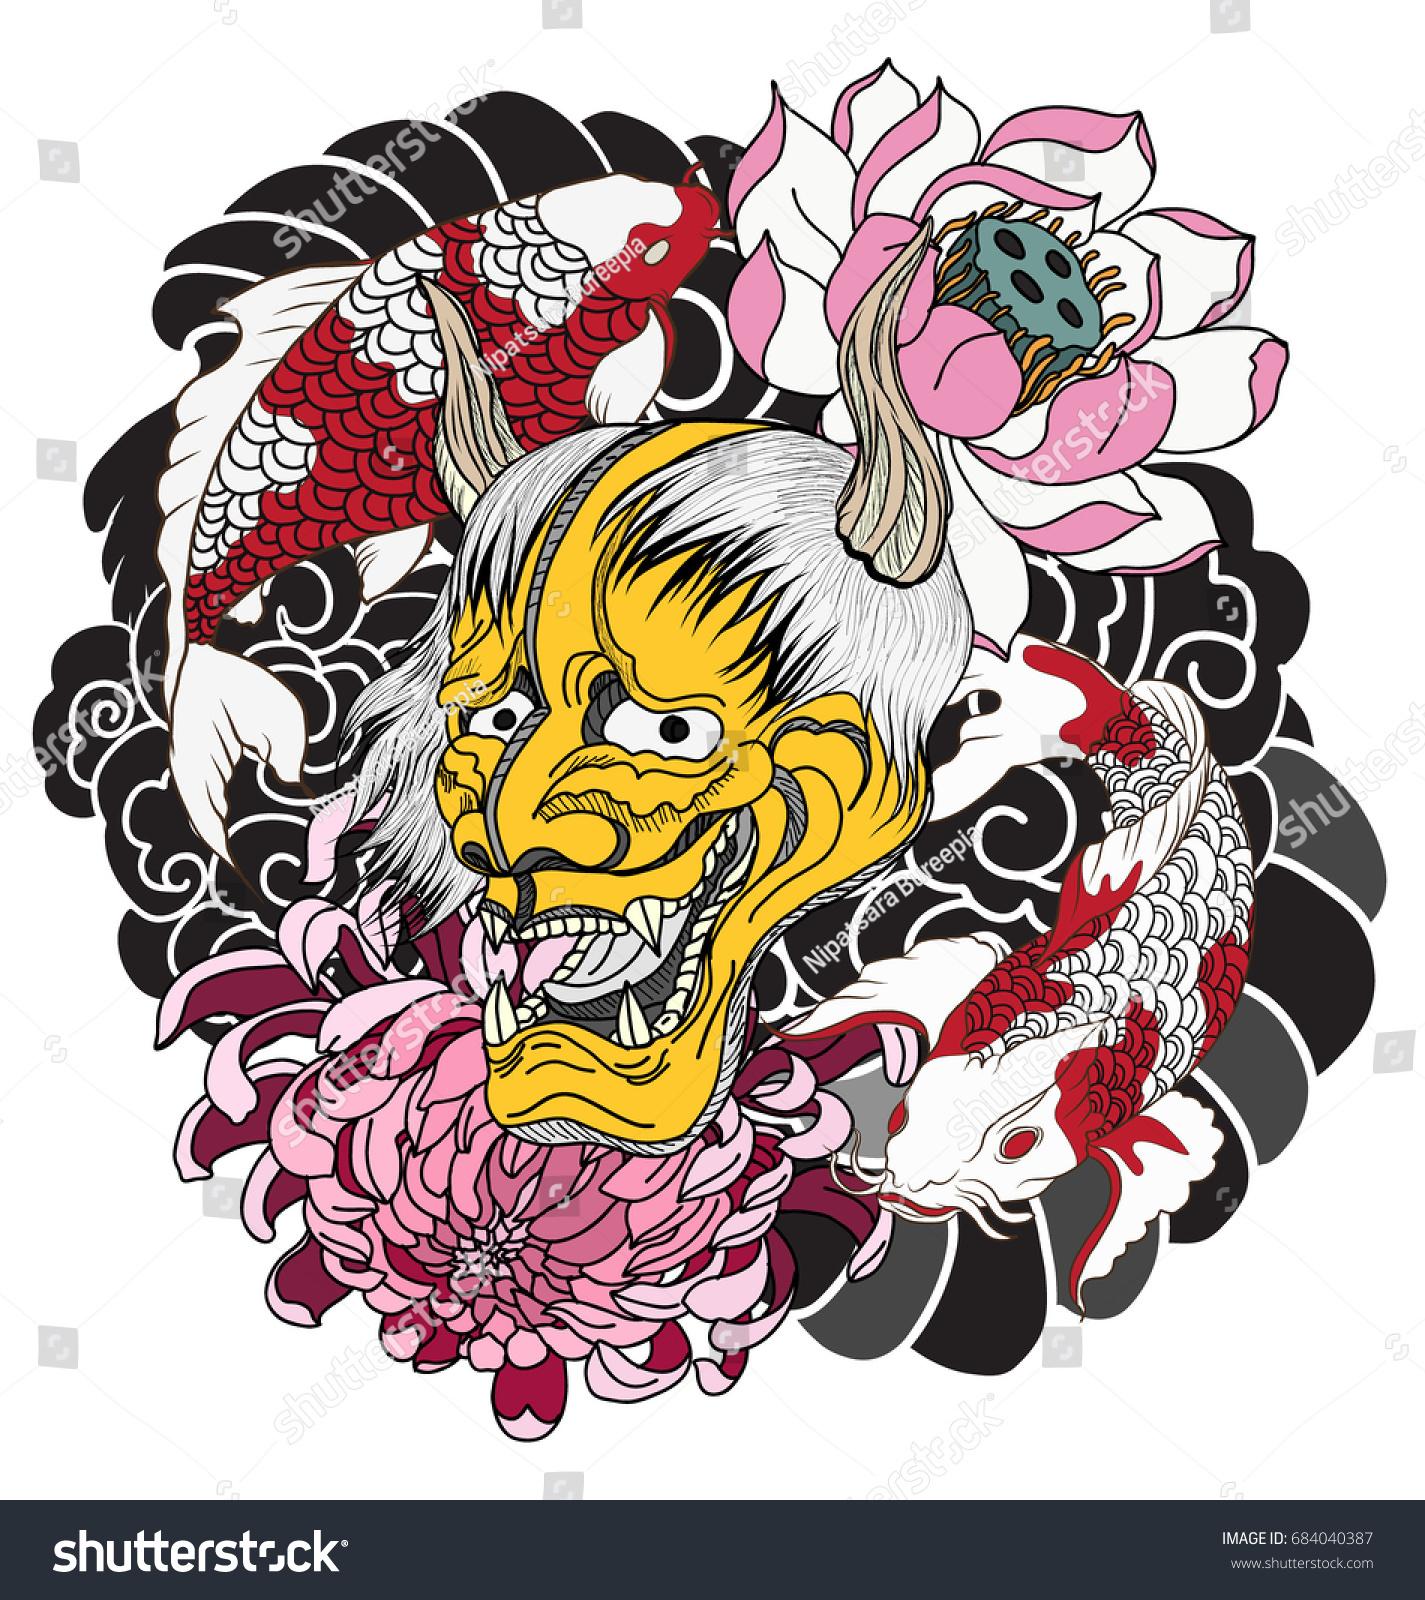 japanese demon mask carp fish tattoo stock vector 684040387 shutterstock. Black Bedroom Furniture Sets. Home Design Ideas